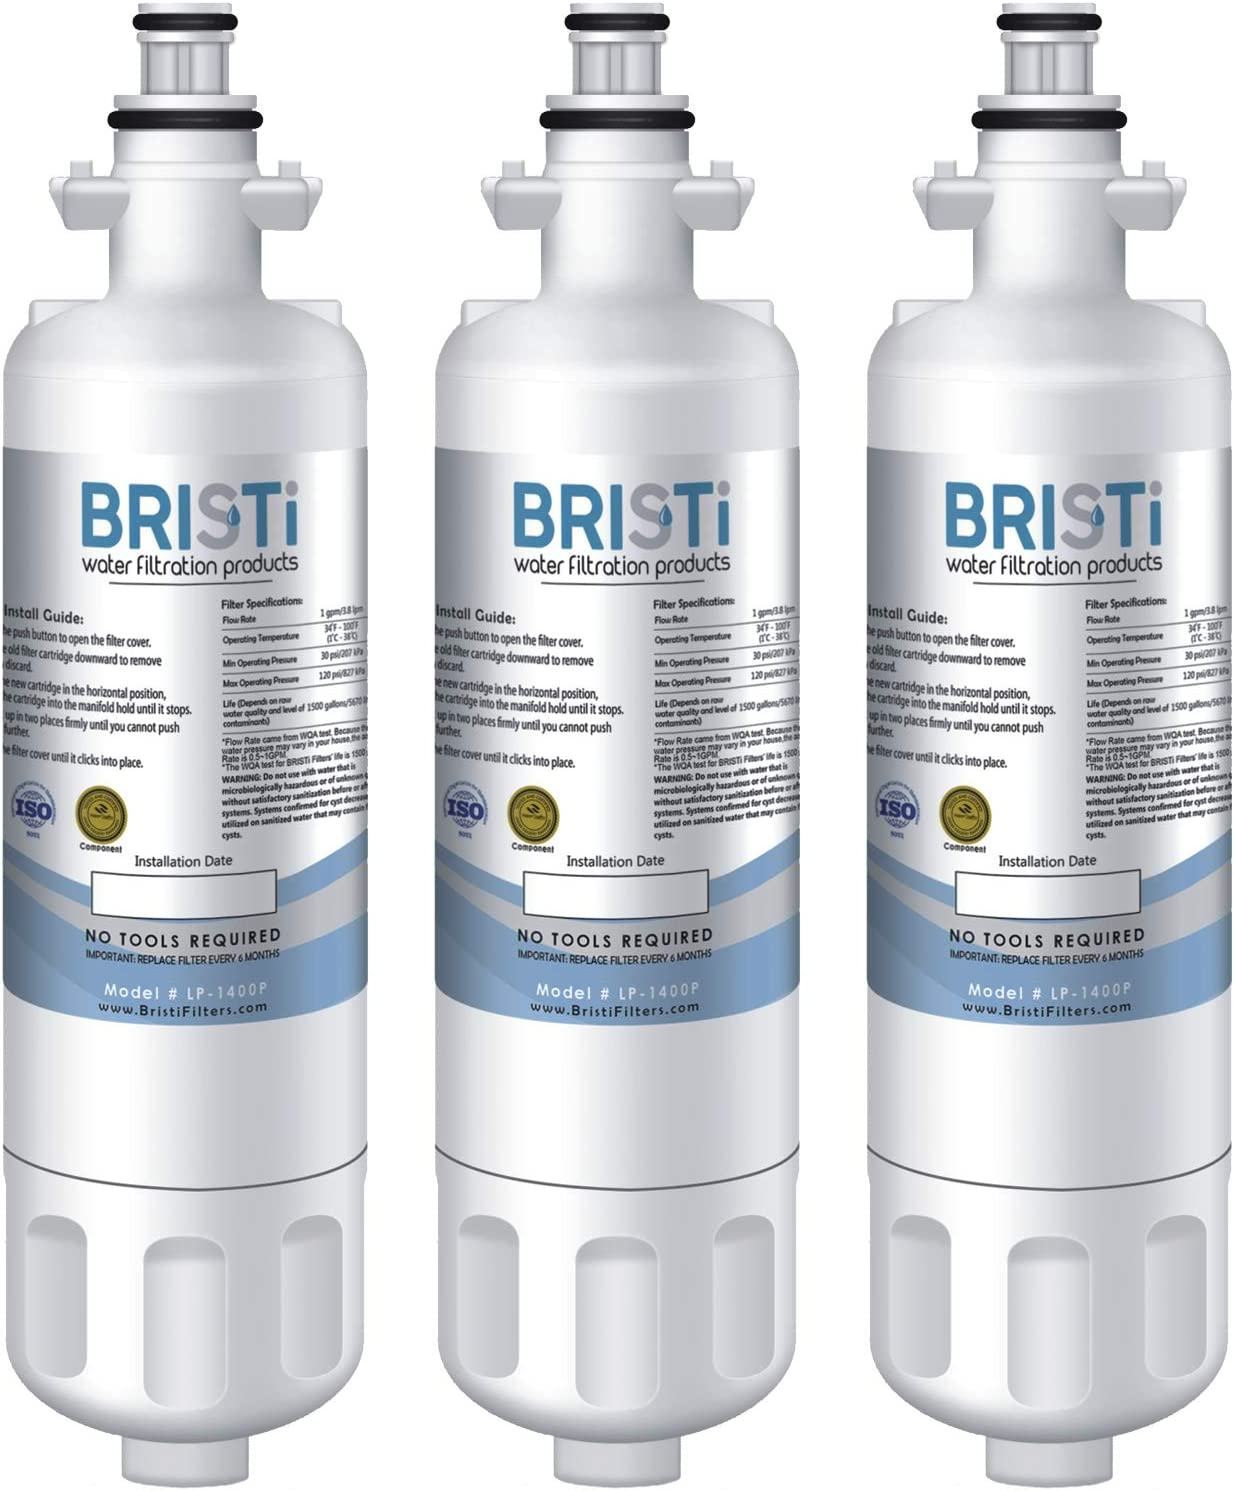 Bristi Refrigerator Water Filter 9690 Compatible LG Models: LT700P, ADQ36006101, ADQ36006102. Compatible Kenmore Models: 9690 & 46-9690. – Replacement for Refrigerators LP-1400P (3 Pack)